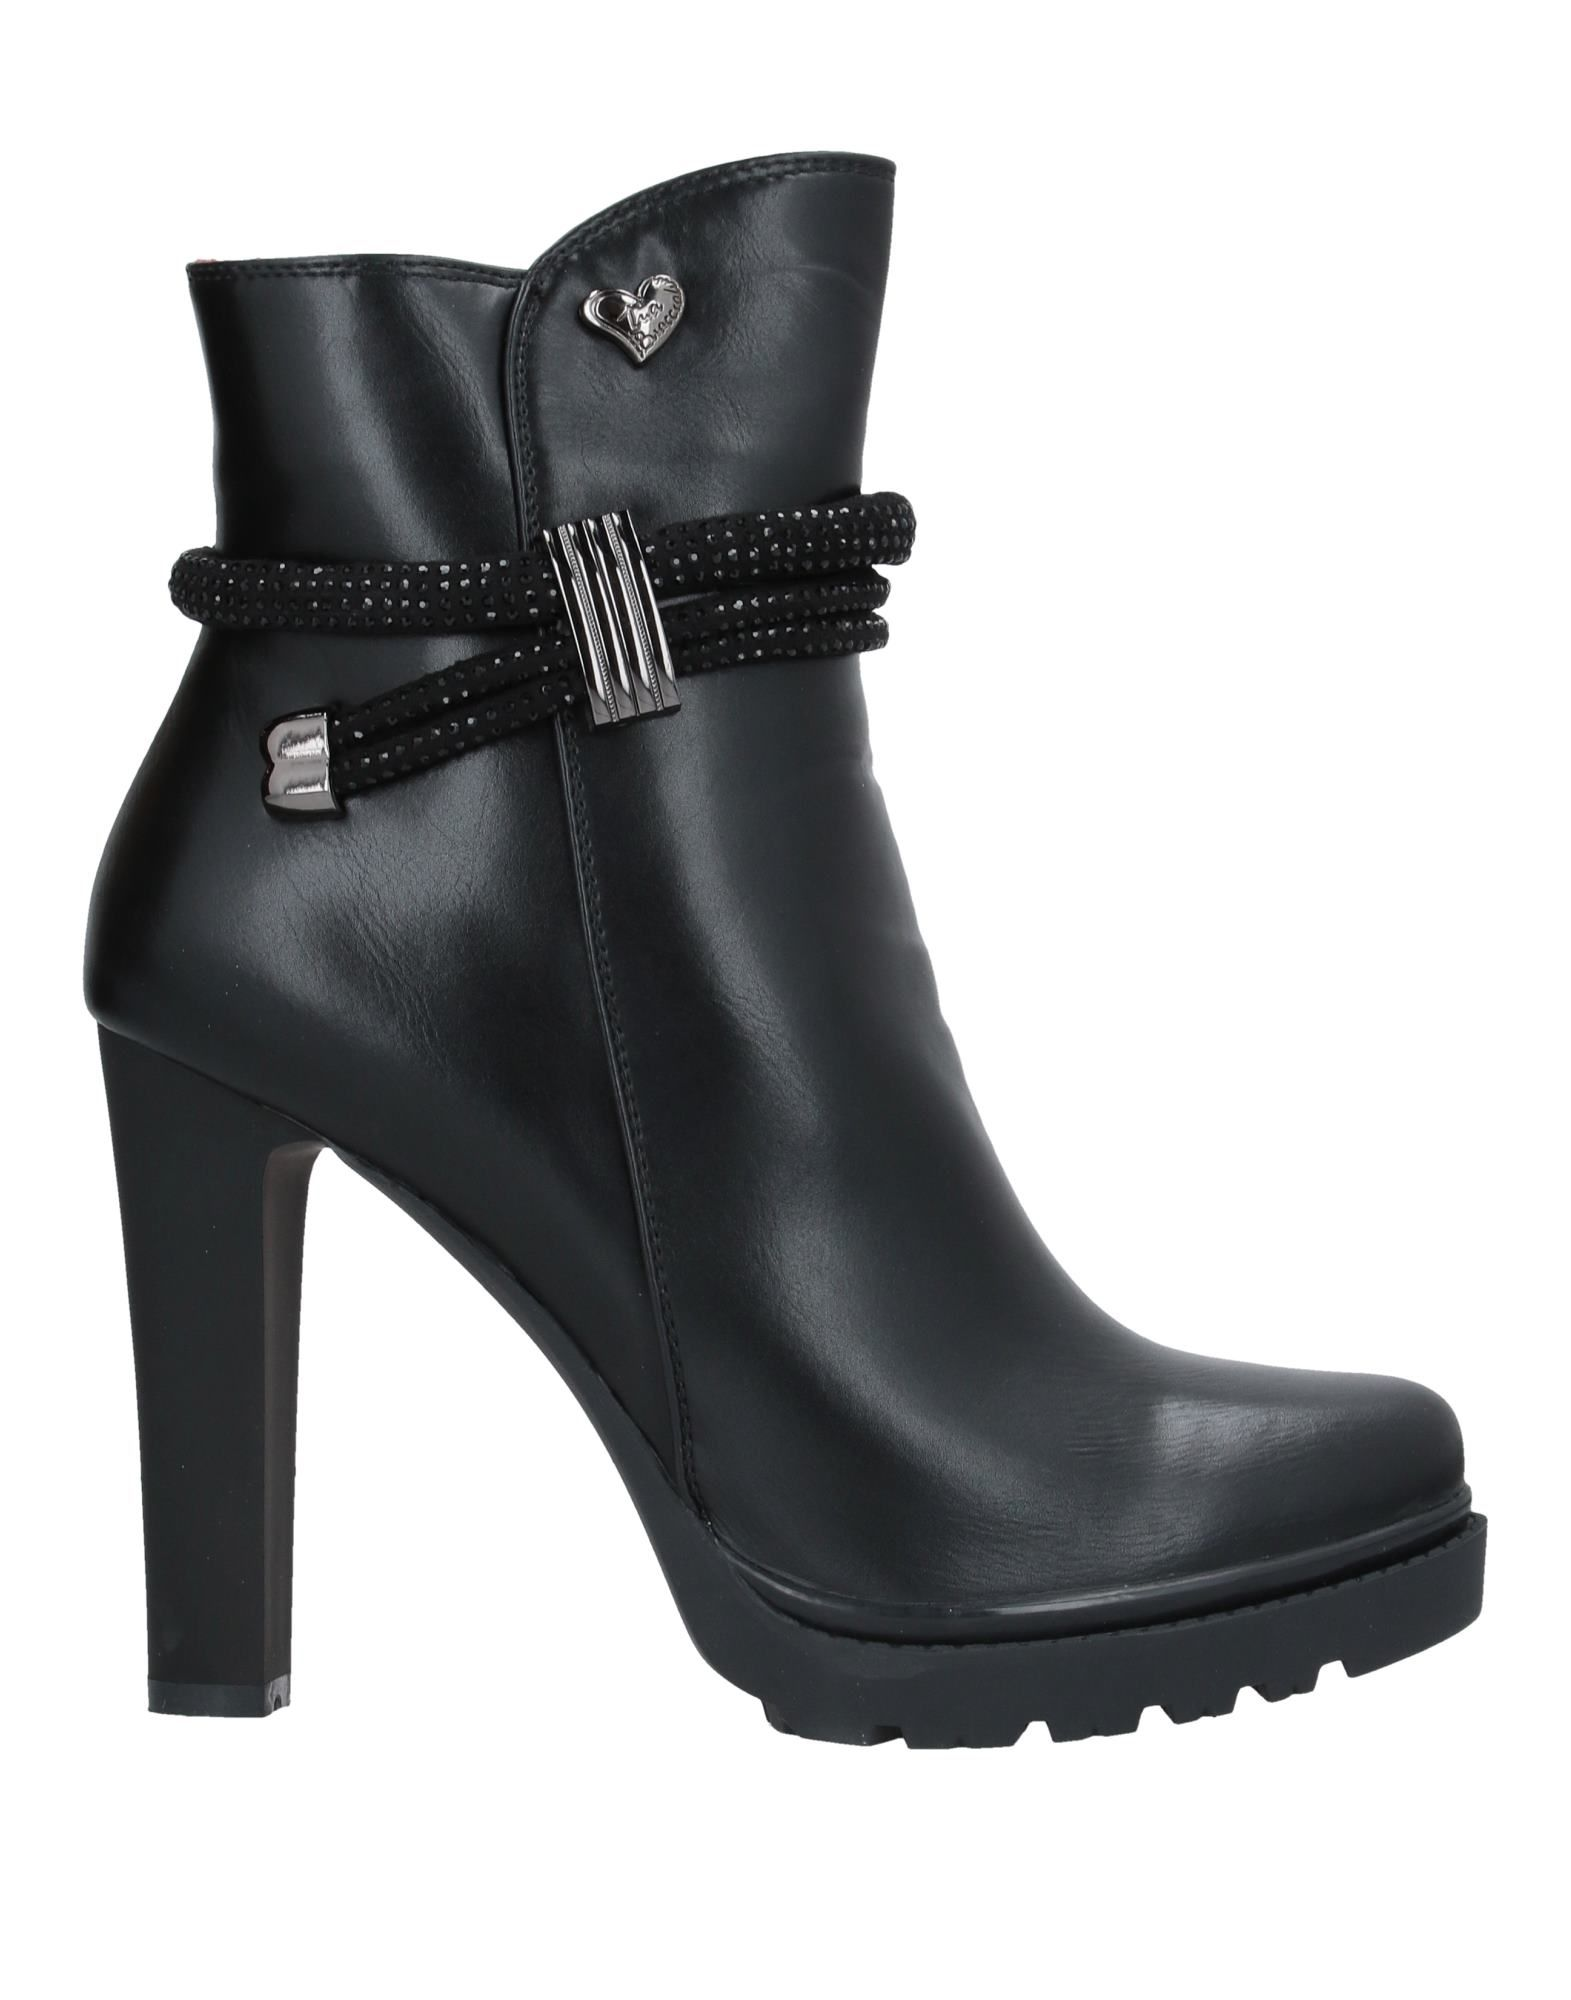 TUA BY BRACCIALINI Полусапоги и высокие ботинки